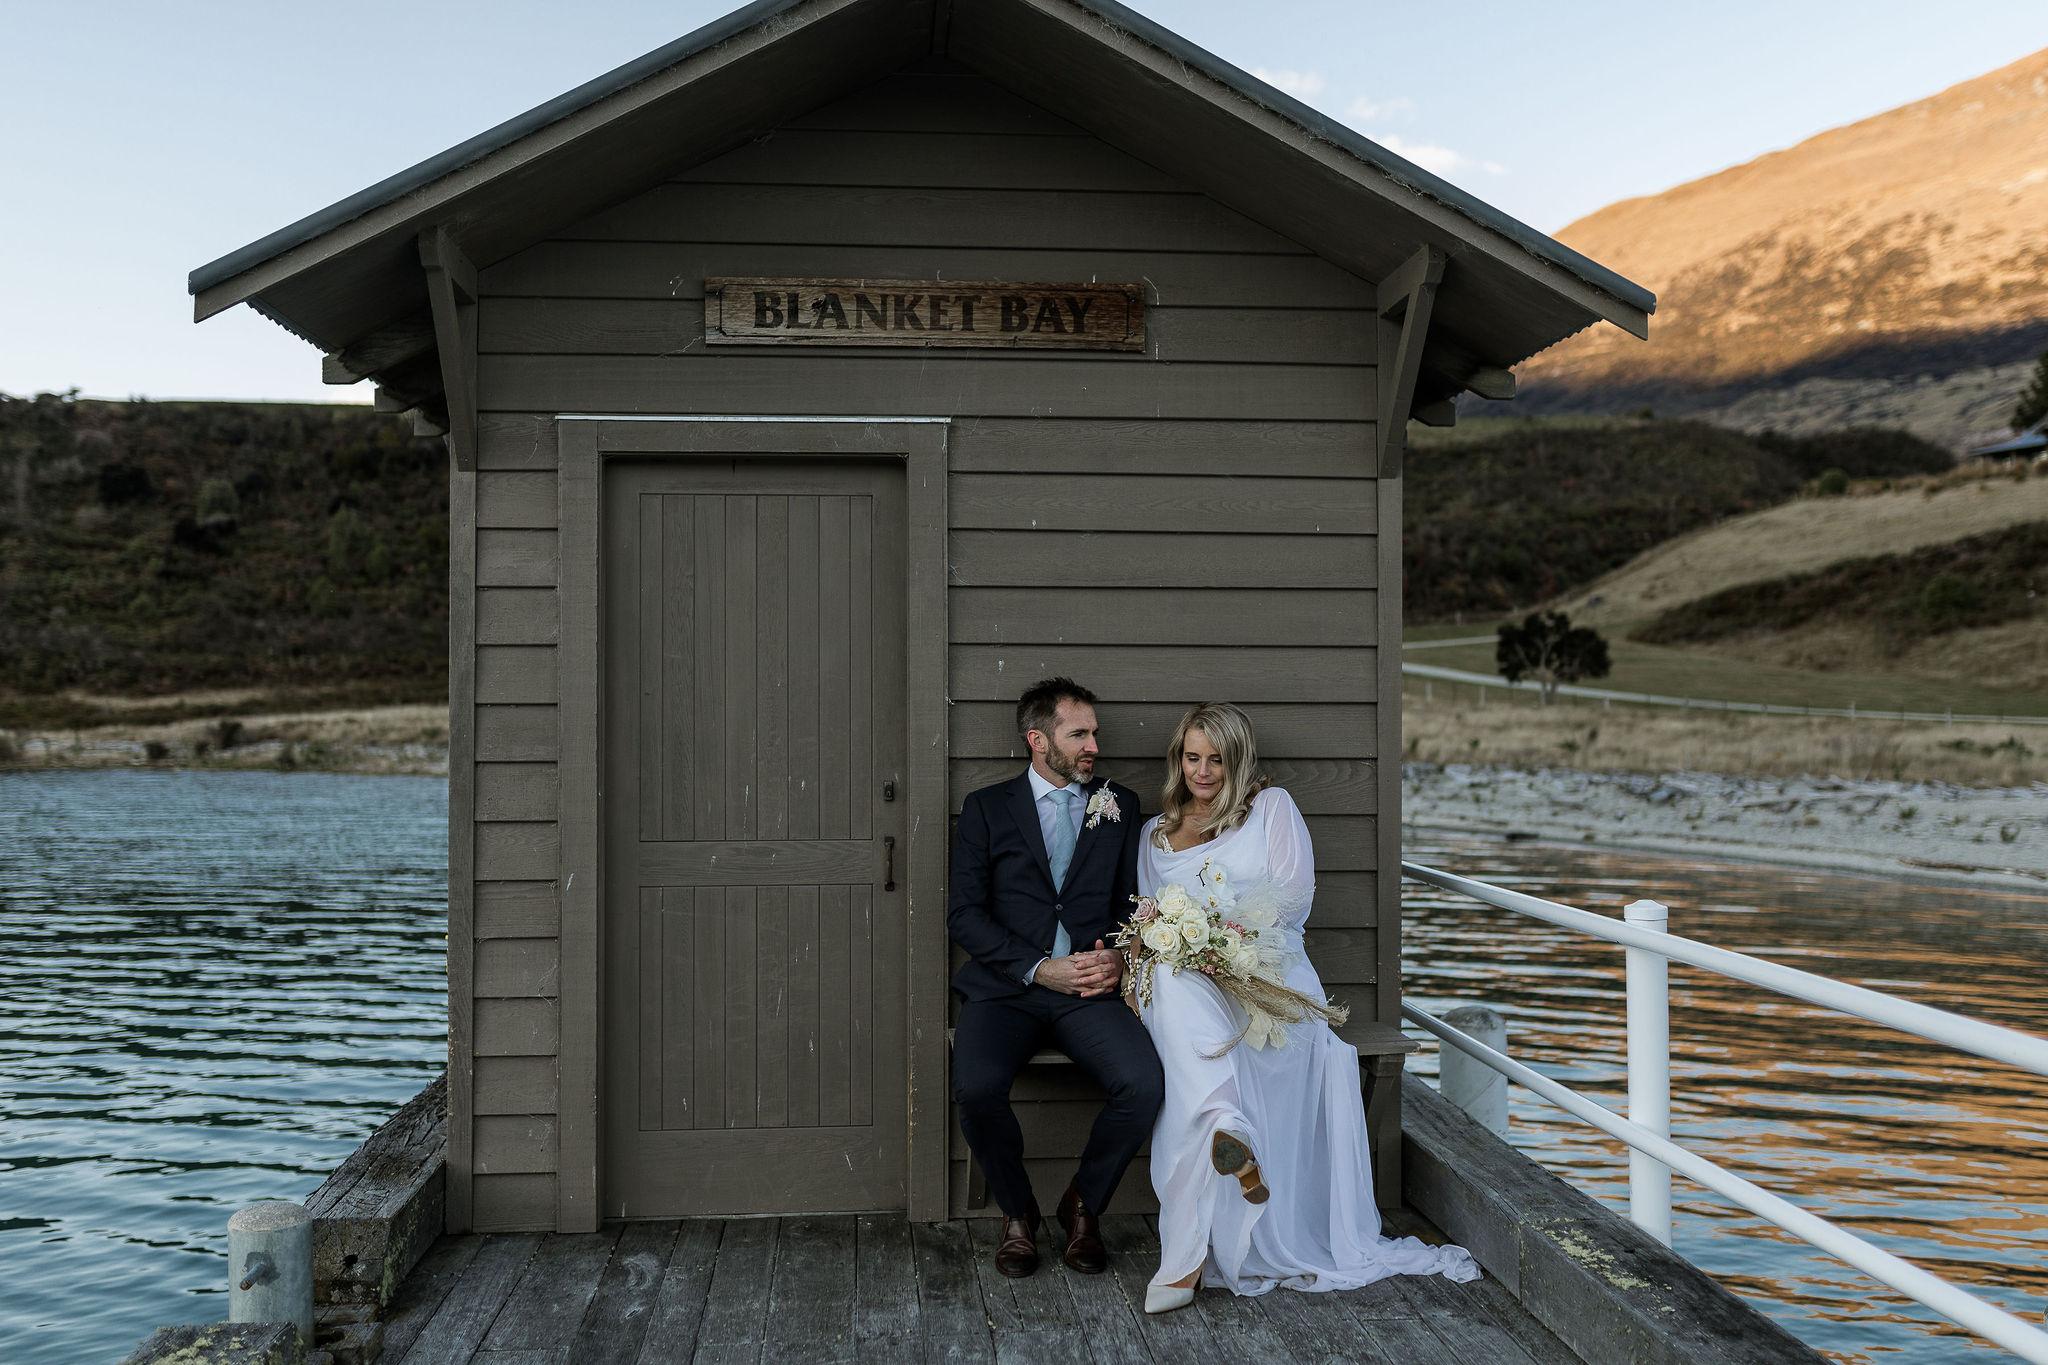 Blanket Bay - Wildly Romantic Weddings & Elopements